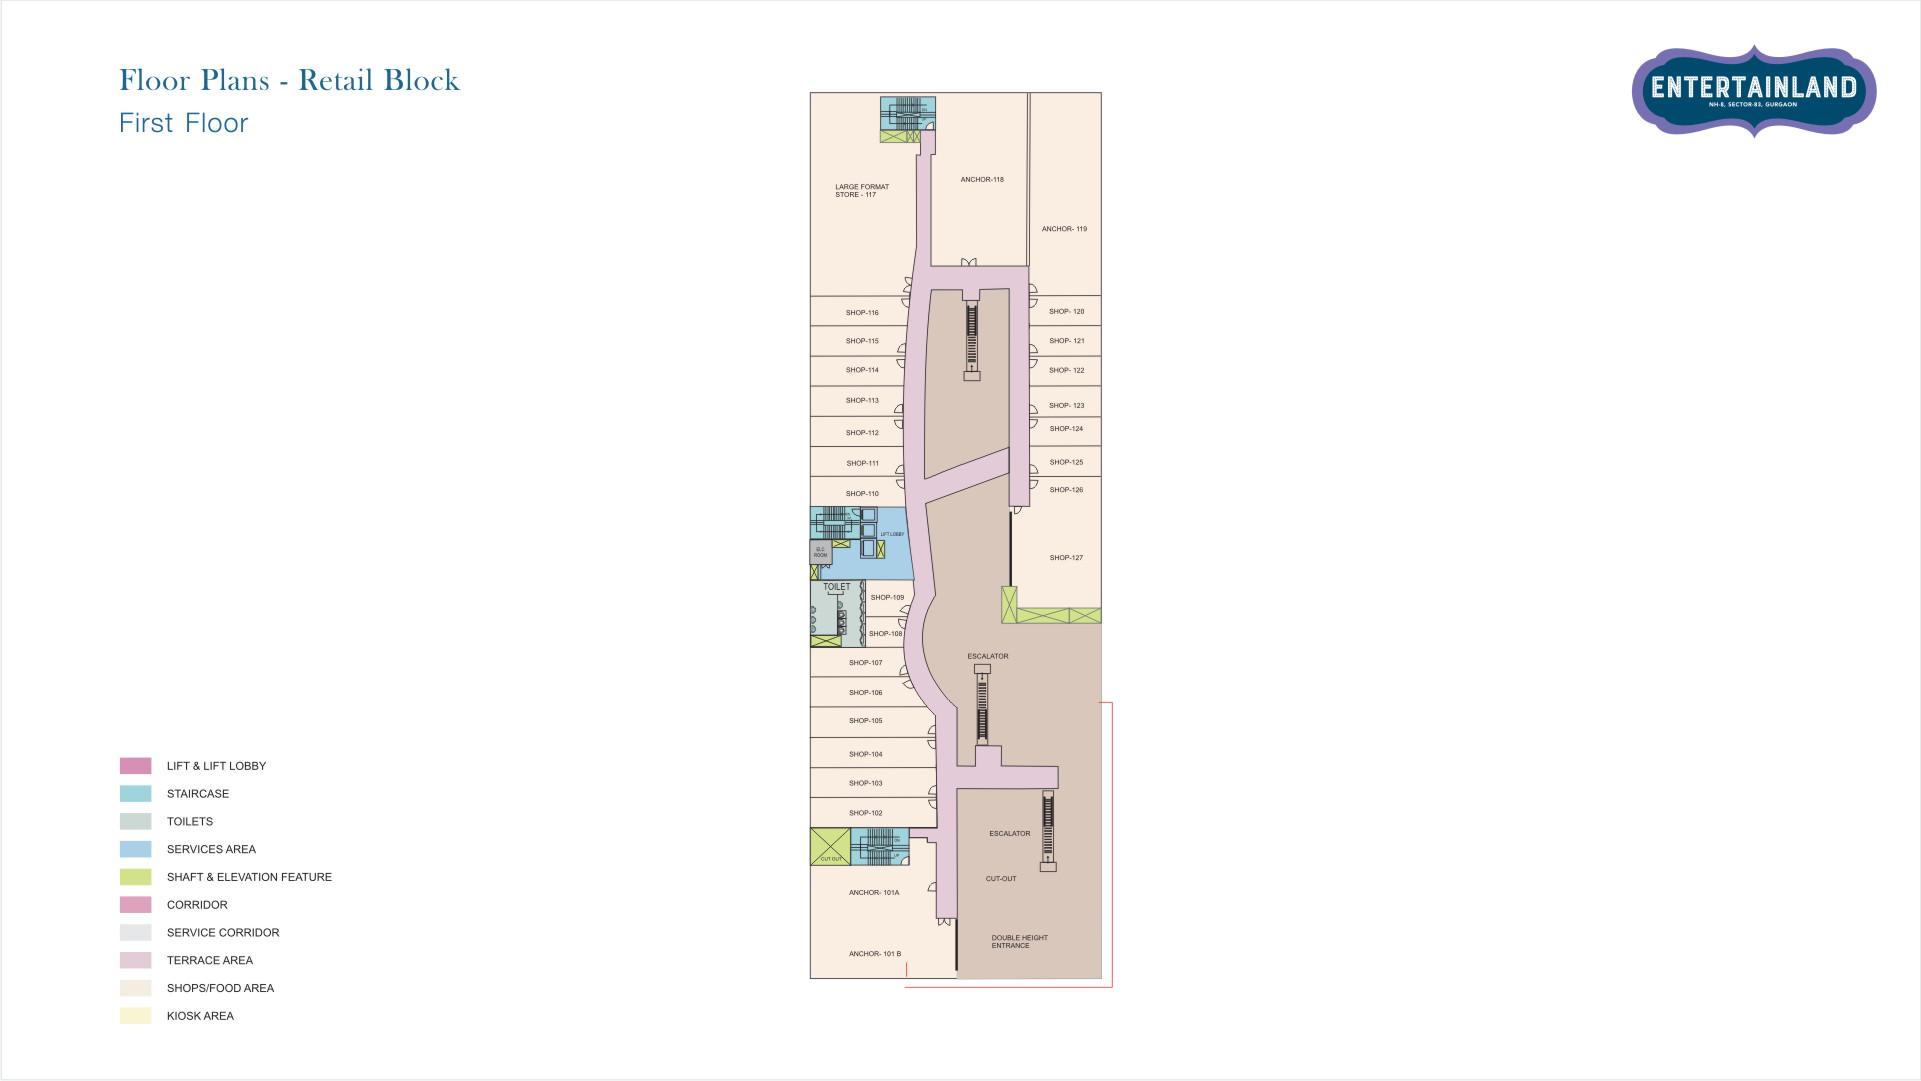 Entertainland Floor Plan 1